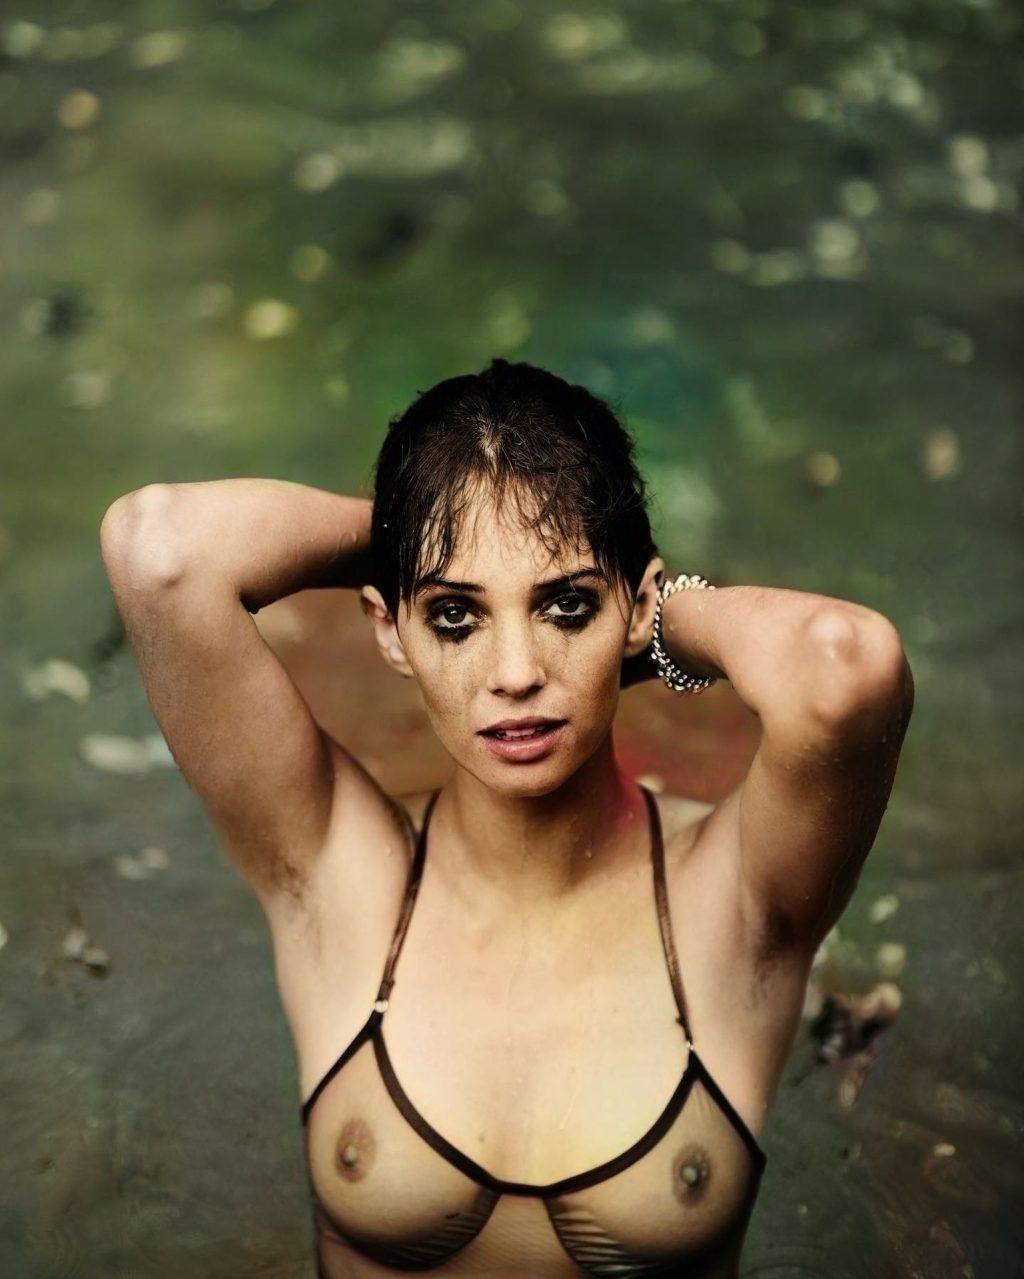 Maya Hawke Shows Off Her Nude Tits (10 Photos)